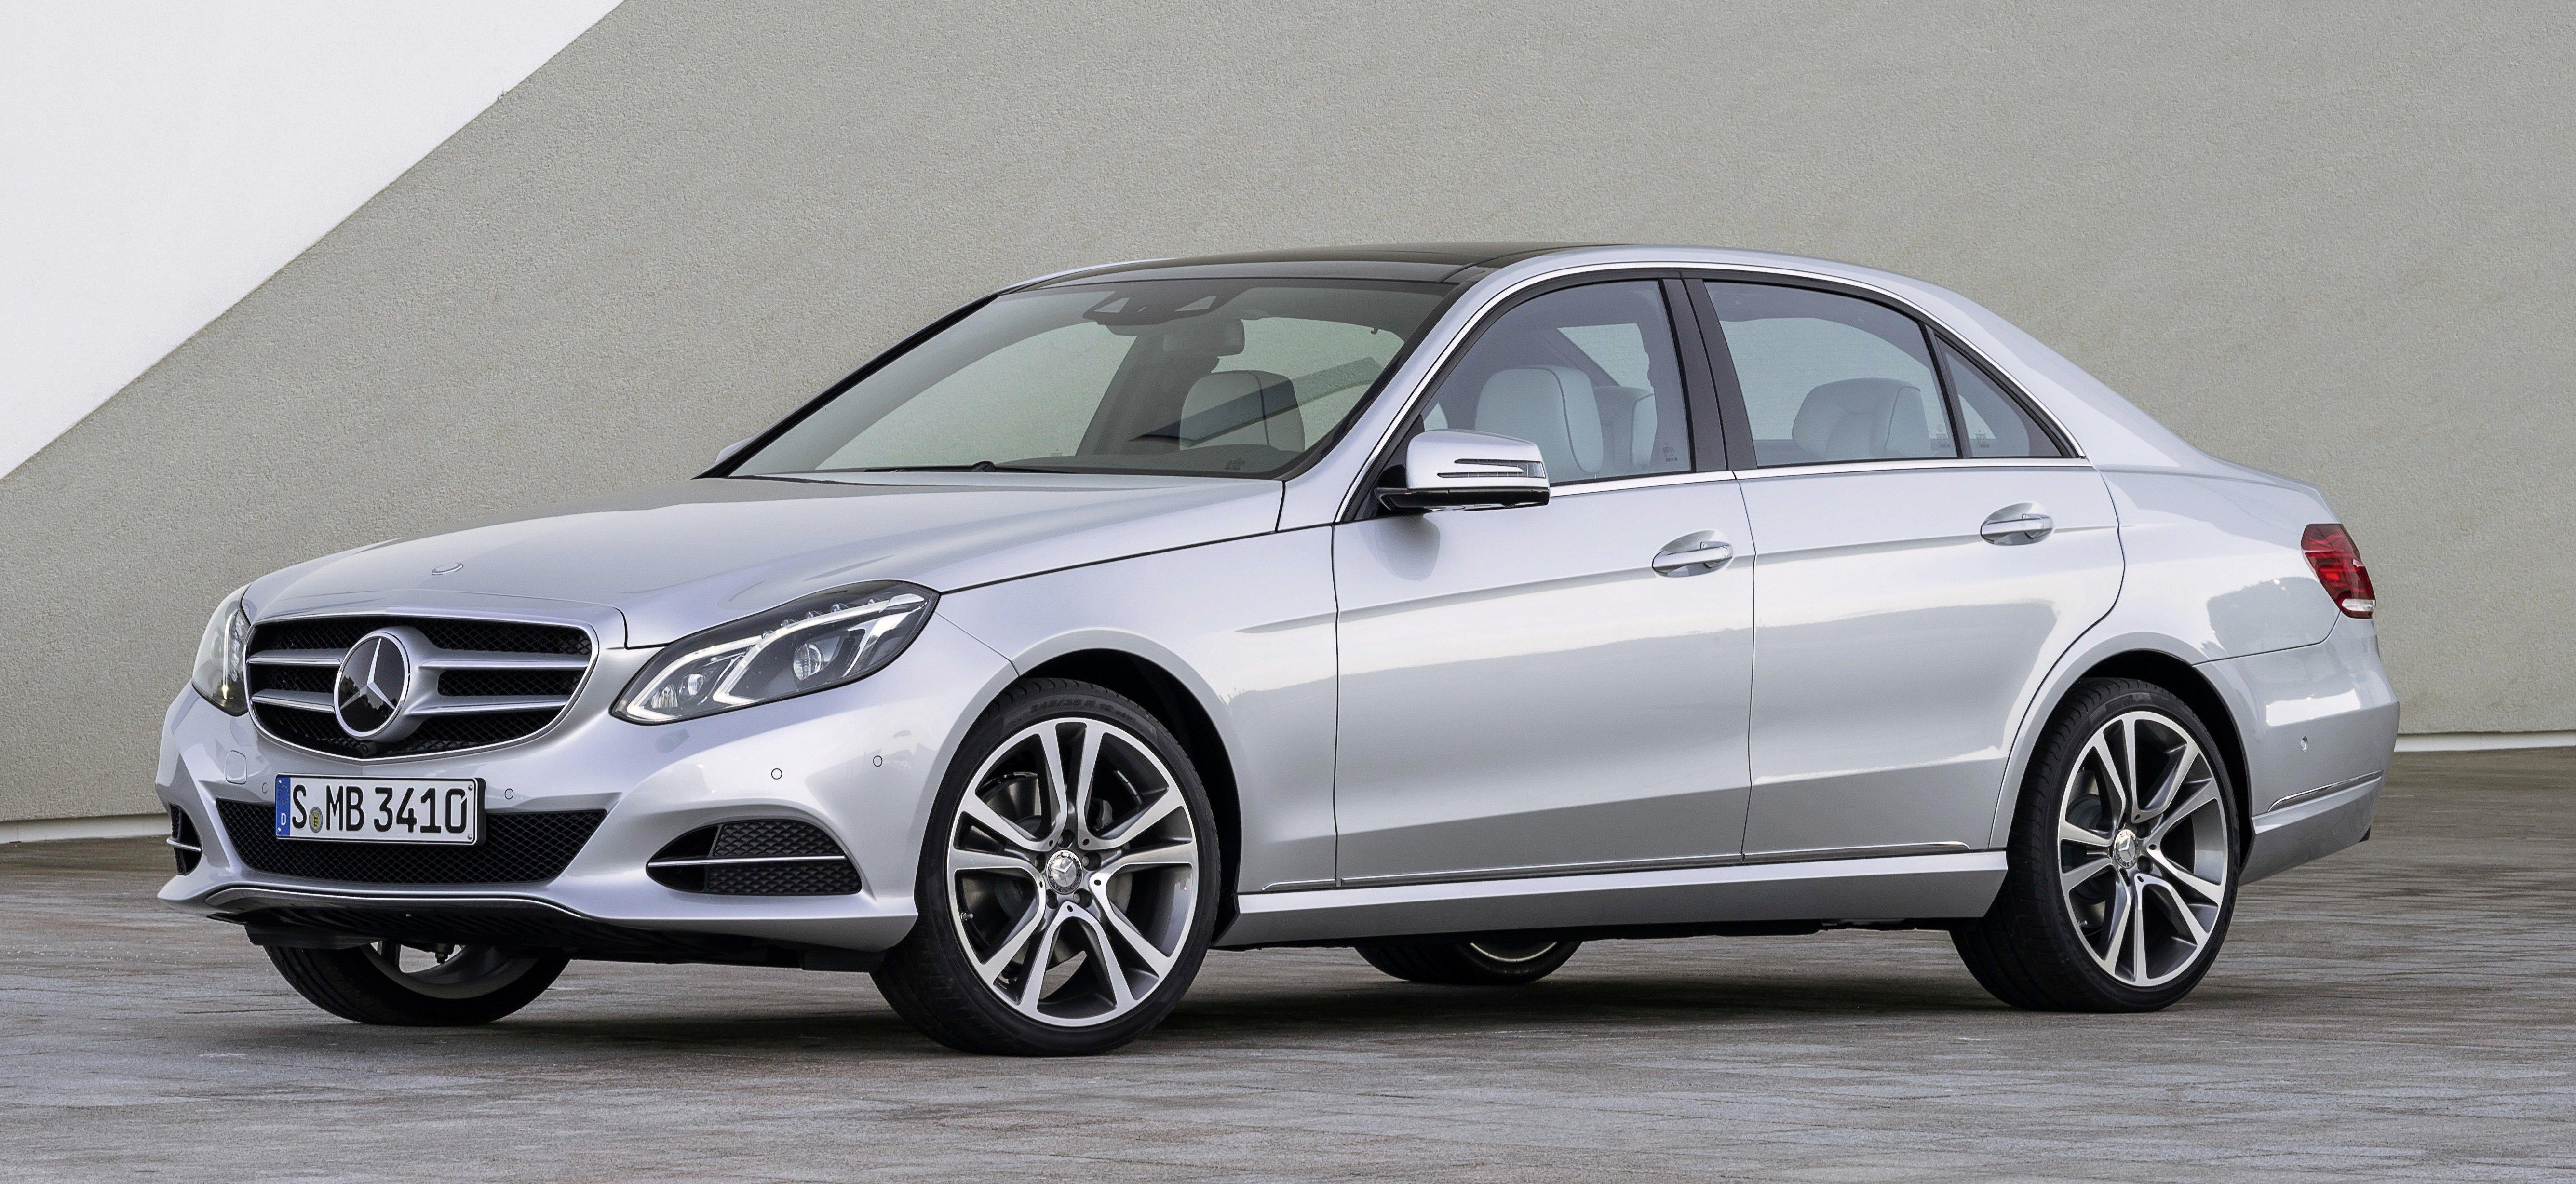 Mercedes G 2018 >> Mercedes-Benz E350 Bluetec first to get 9G-TRONIC Paul Tan - Image 188764